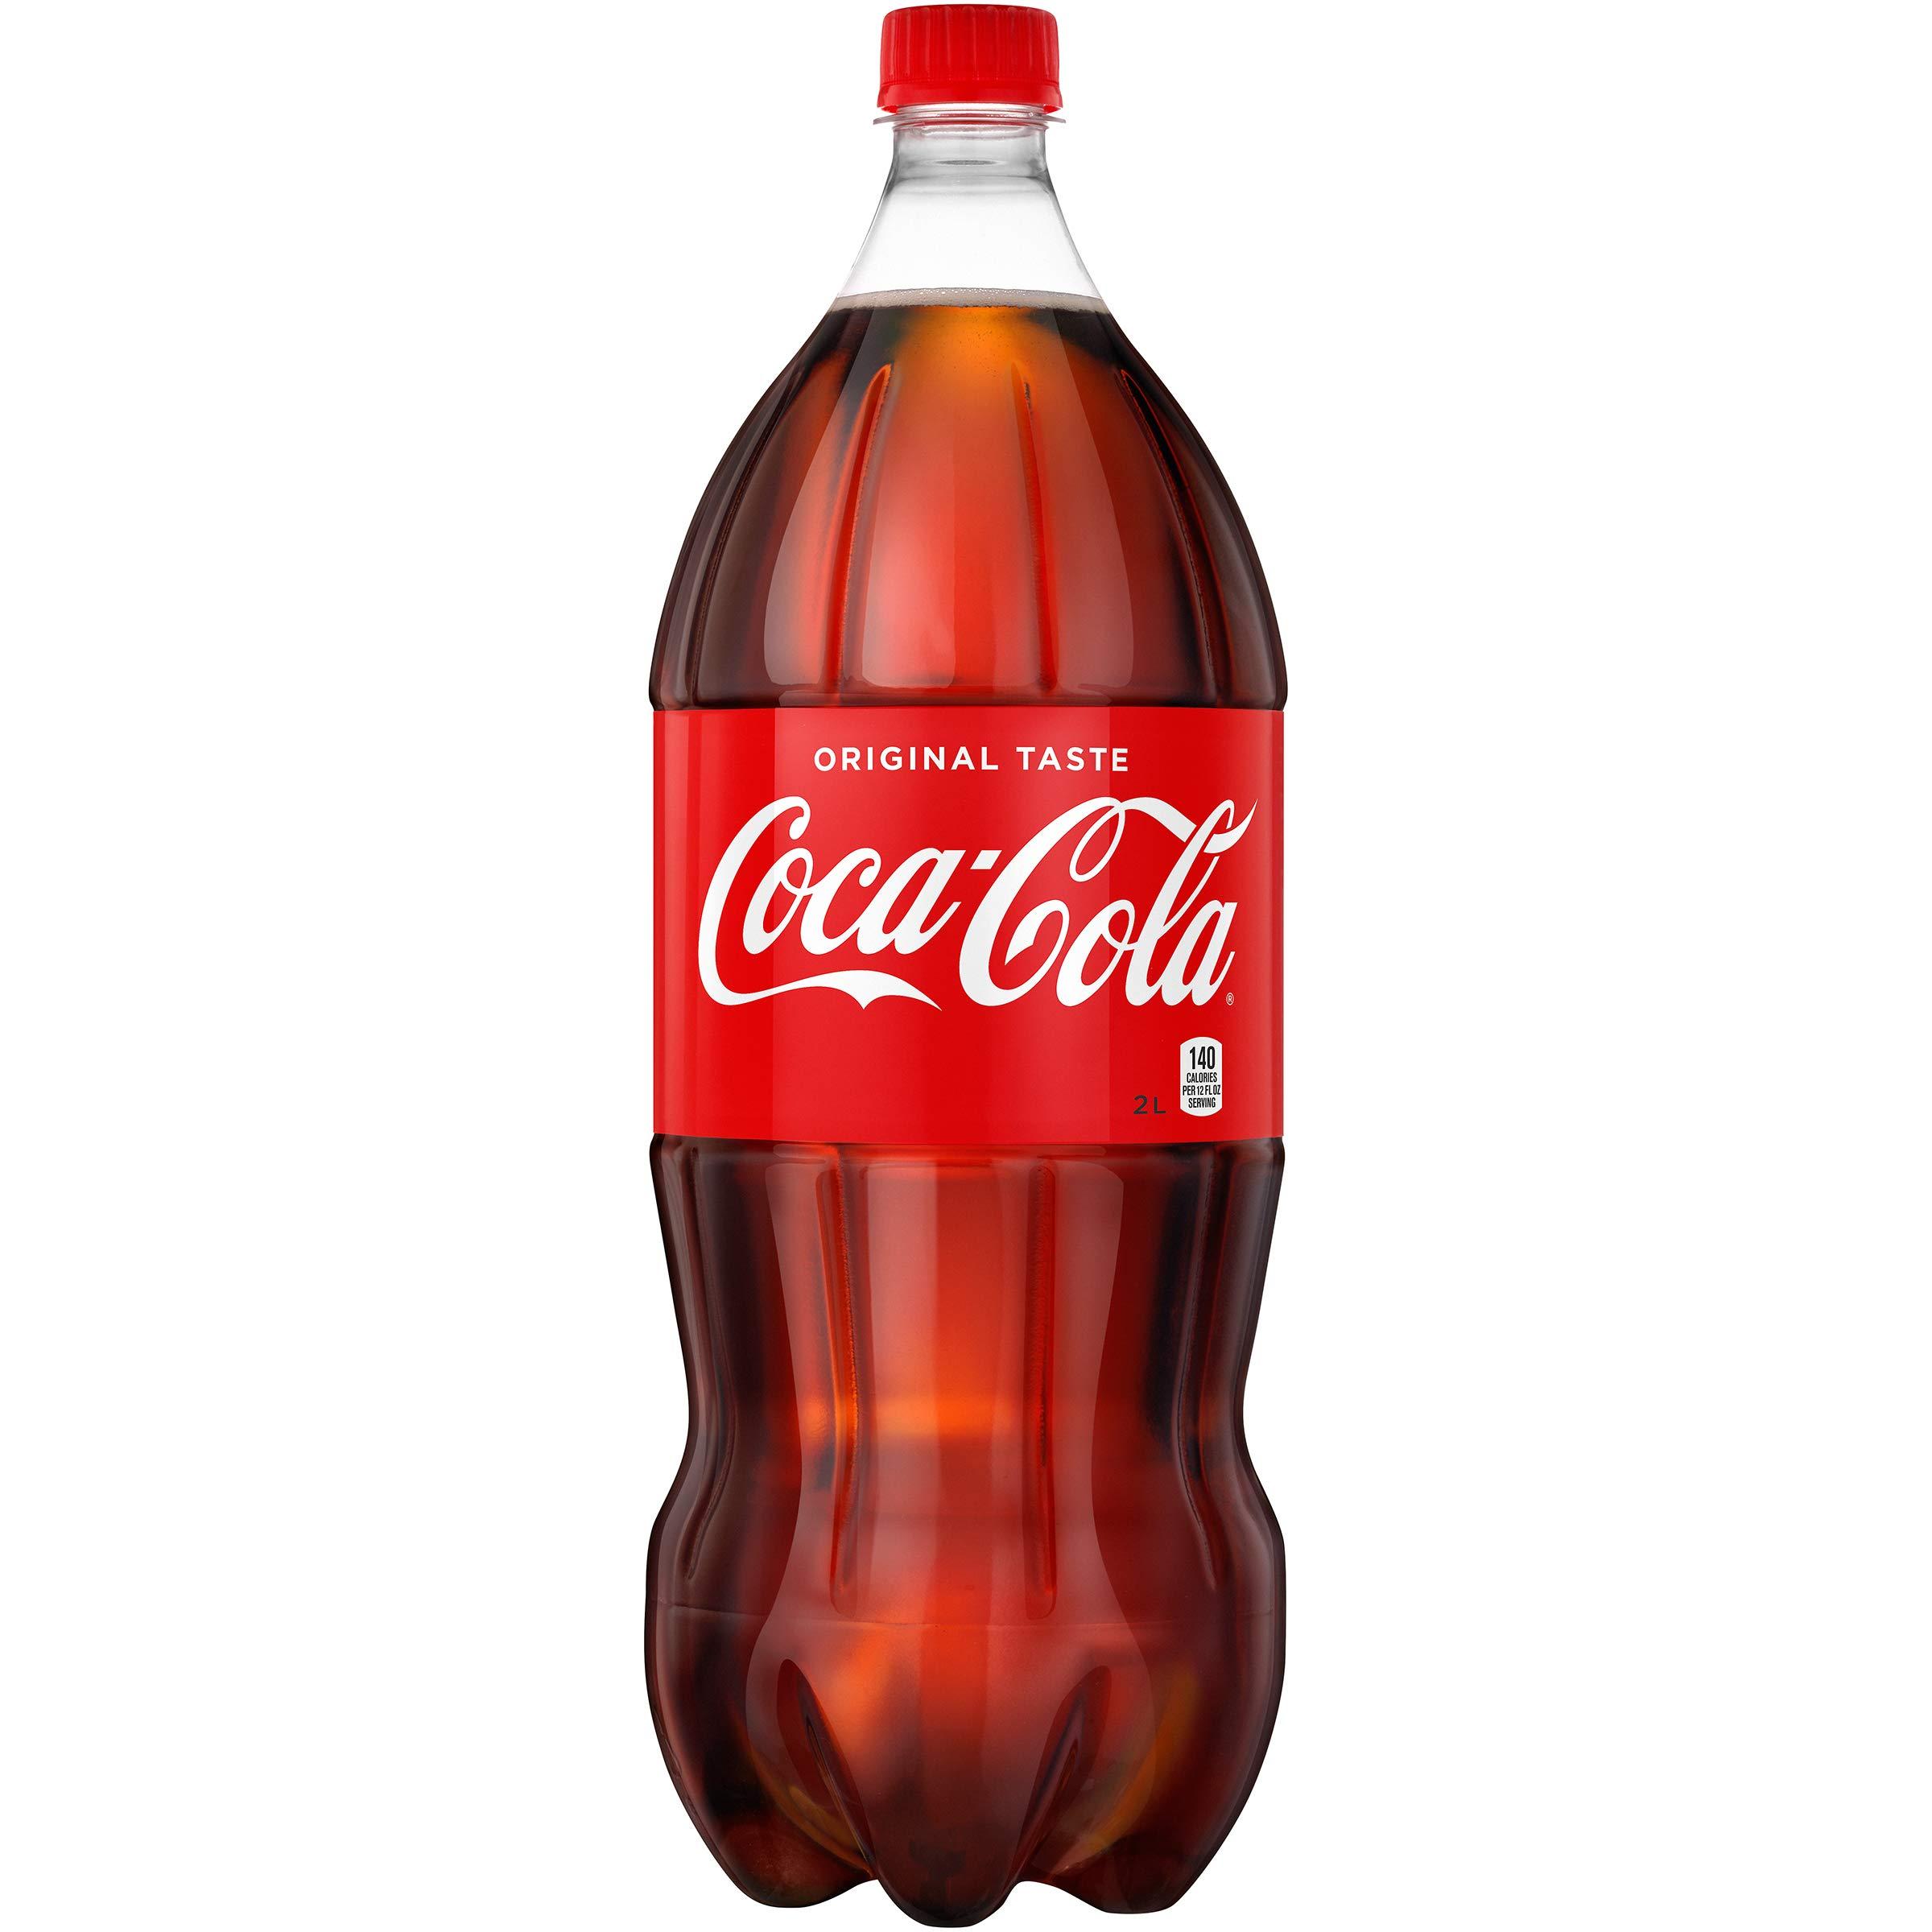 COCA COLA COLA SODA REGULAR PLASTIC BOTTLE - 0049000050101, 67.6 Fl Oz (Pack of 1)